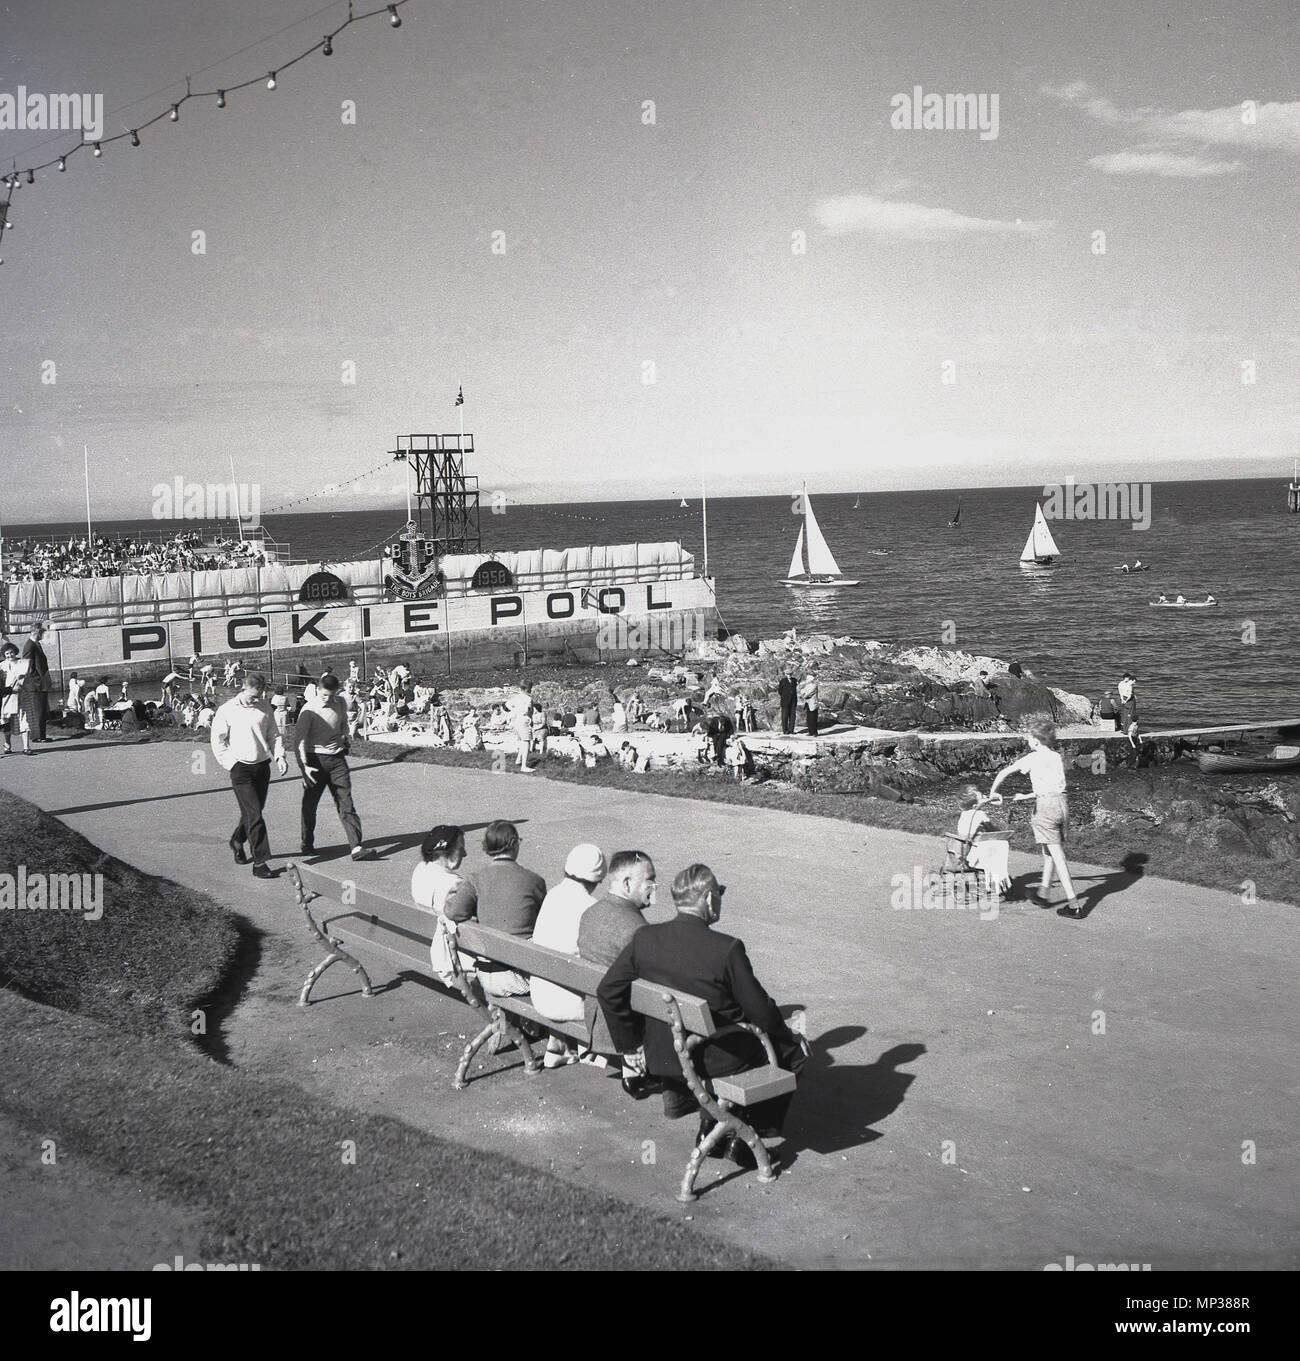 1950s swimming pool stock photos 1950s swimming pool - Bangor swimming pool northern ireland ...